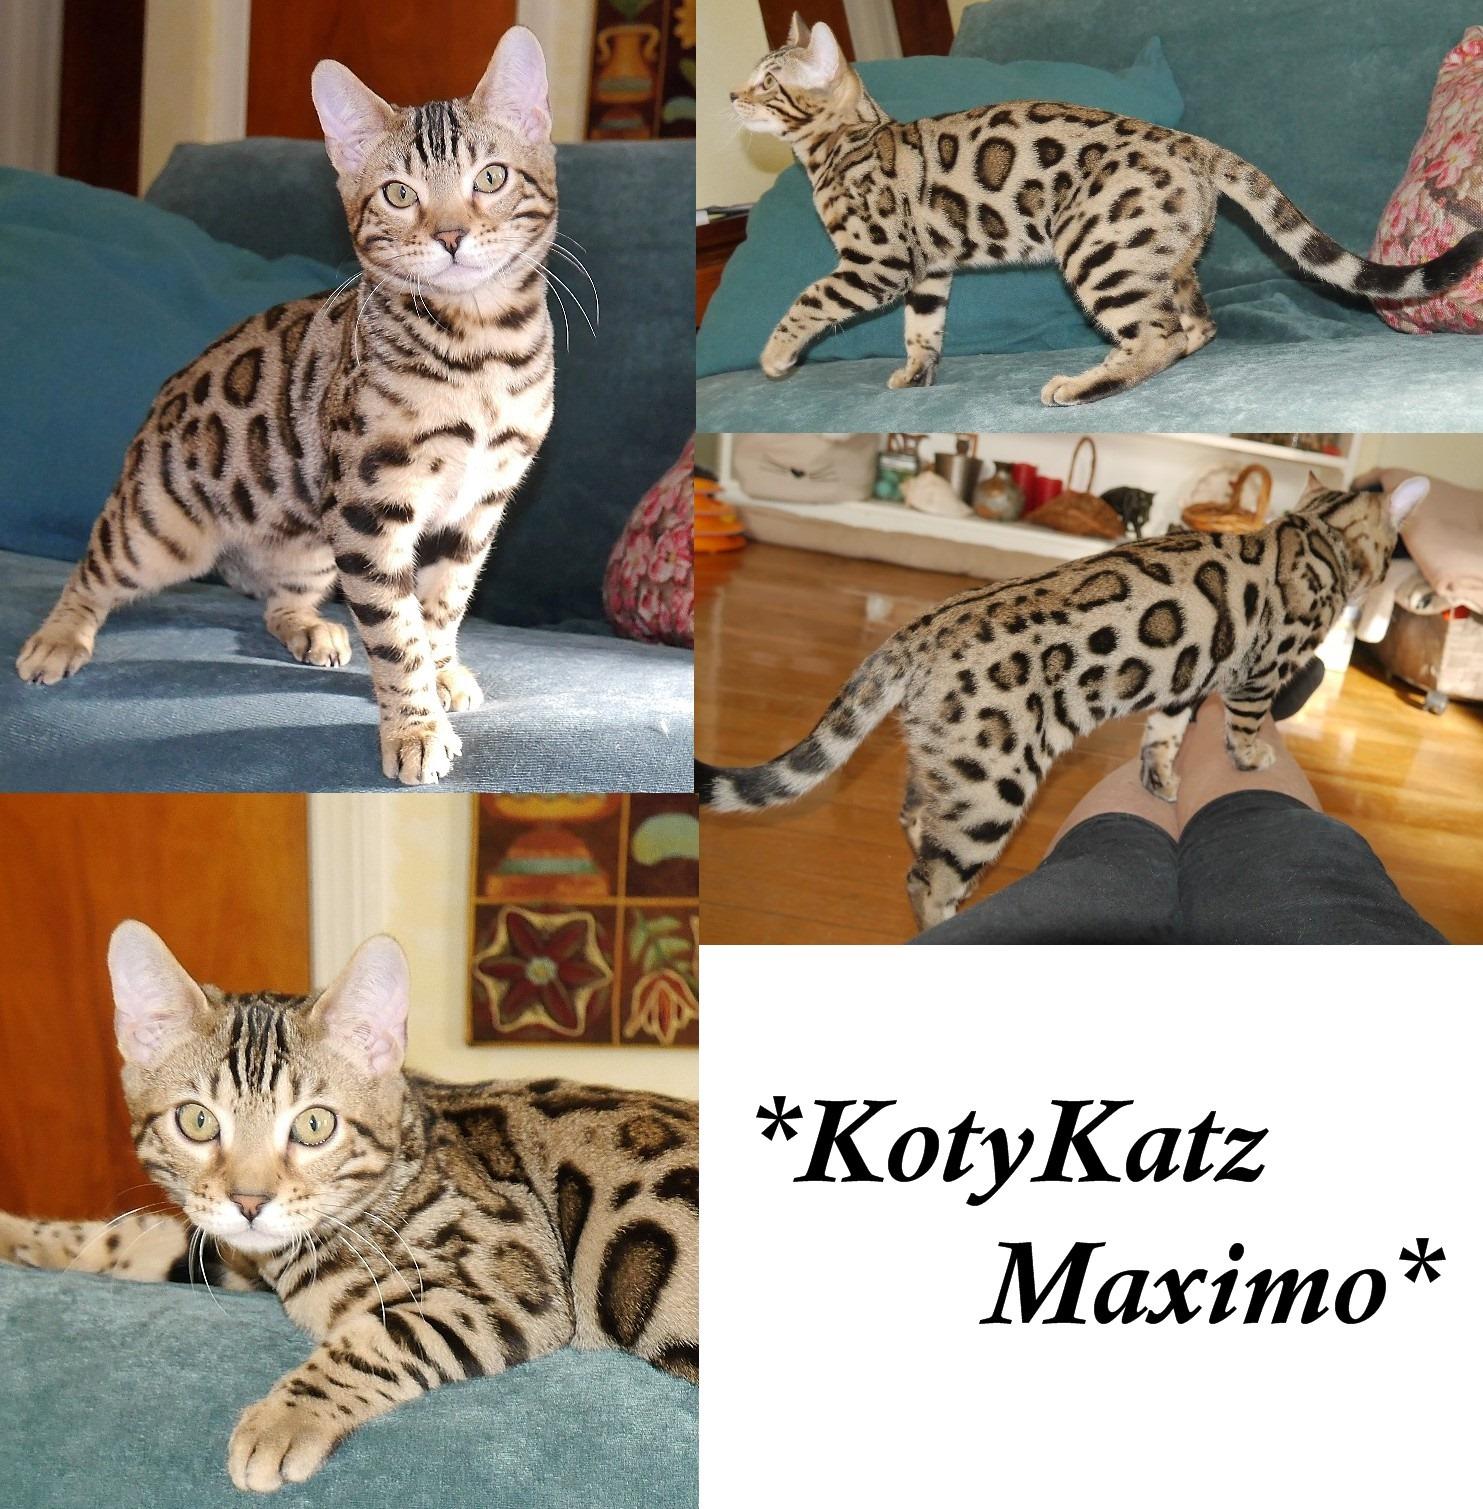 KotyKatz Maximo